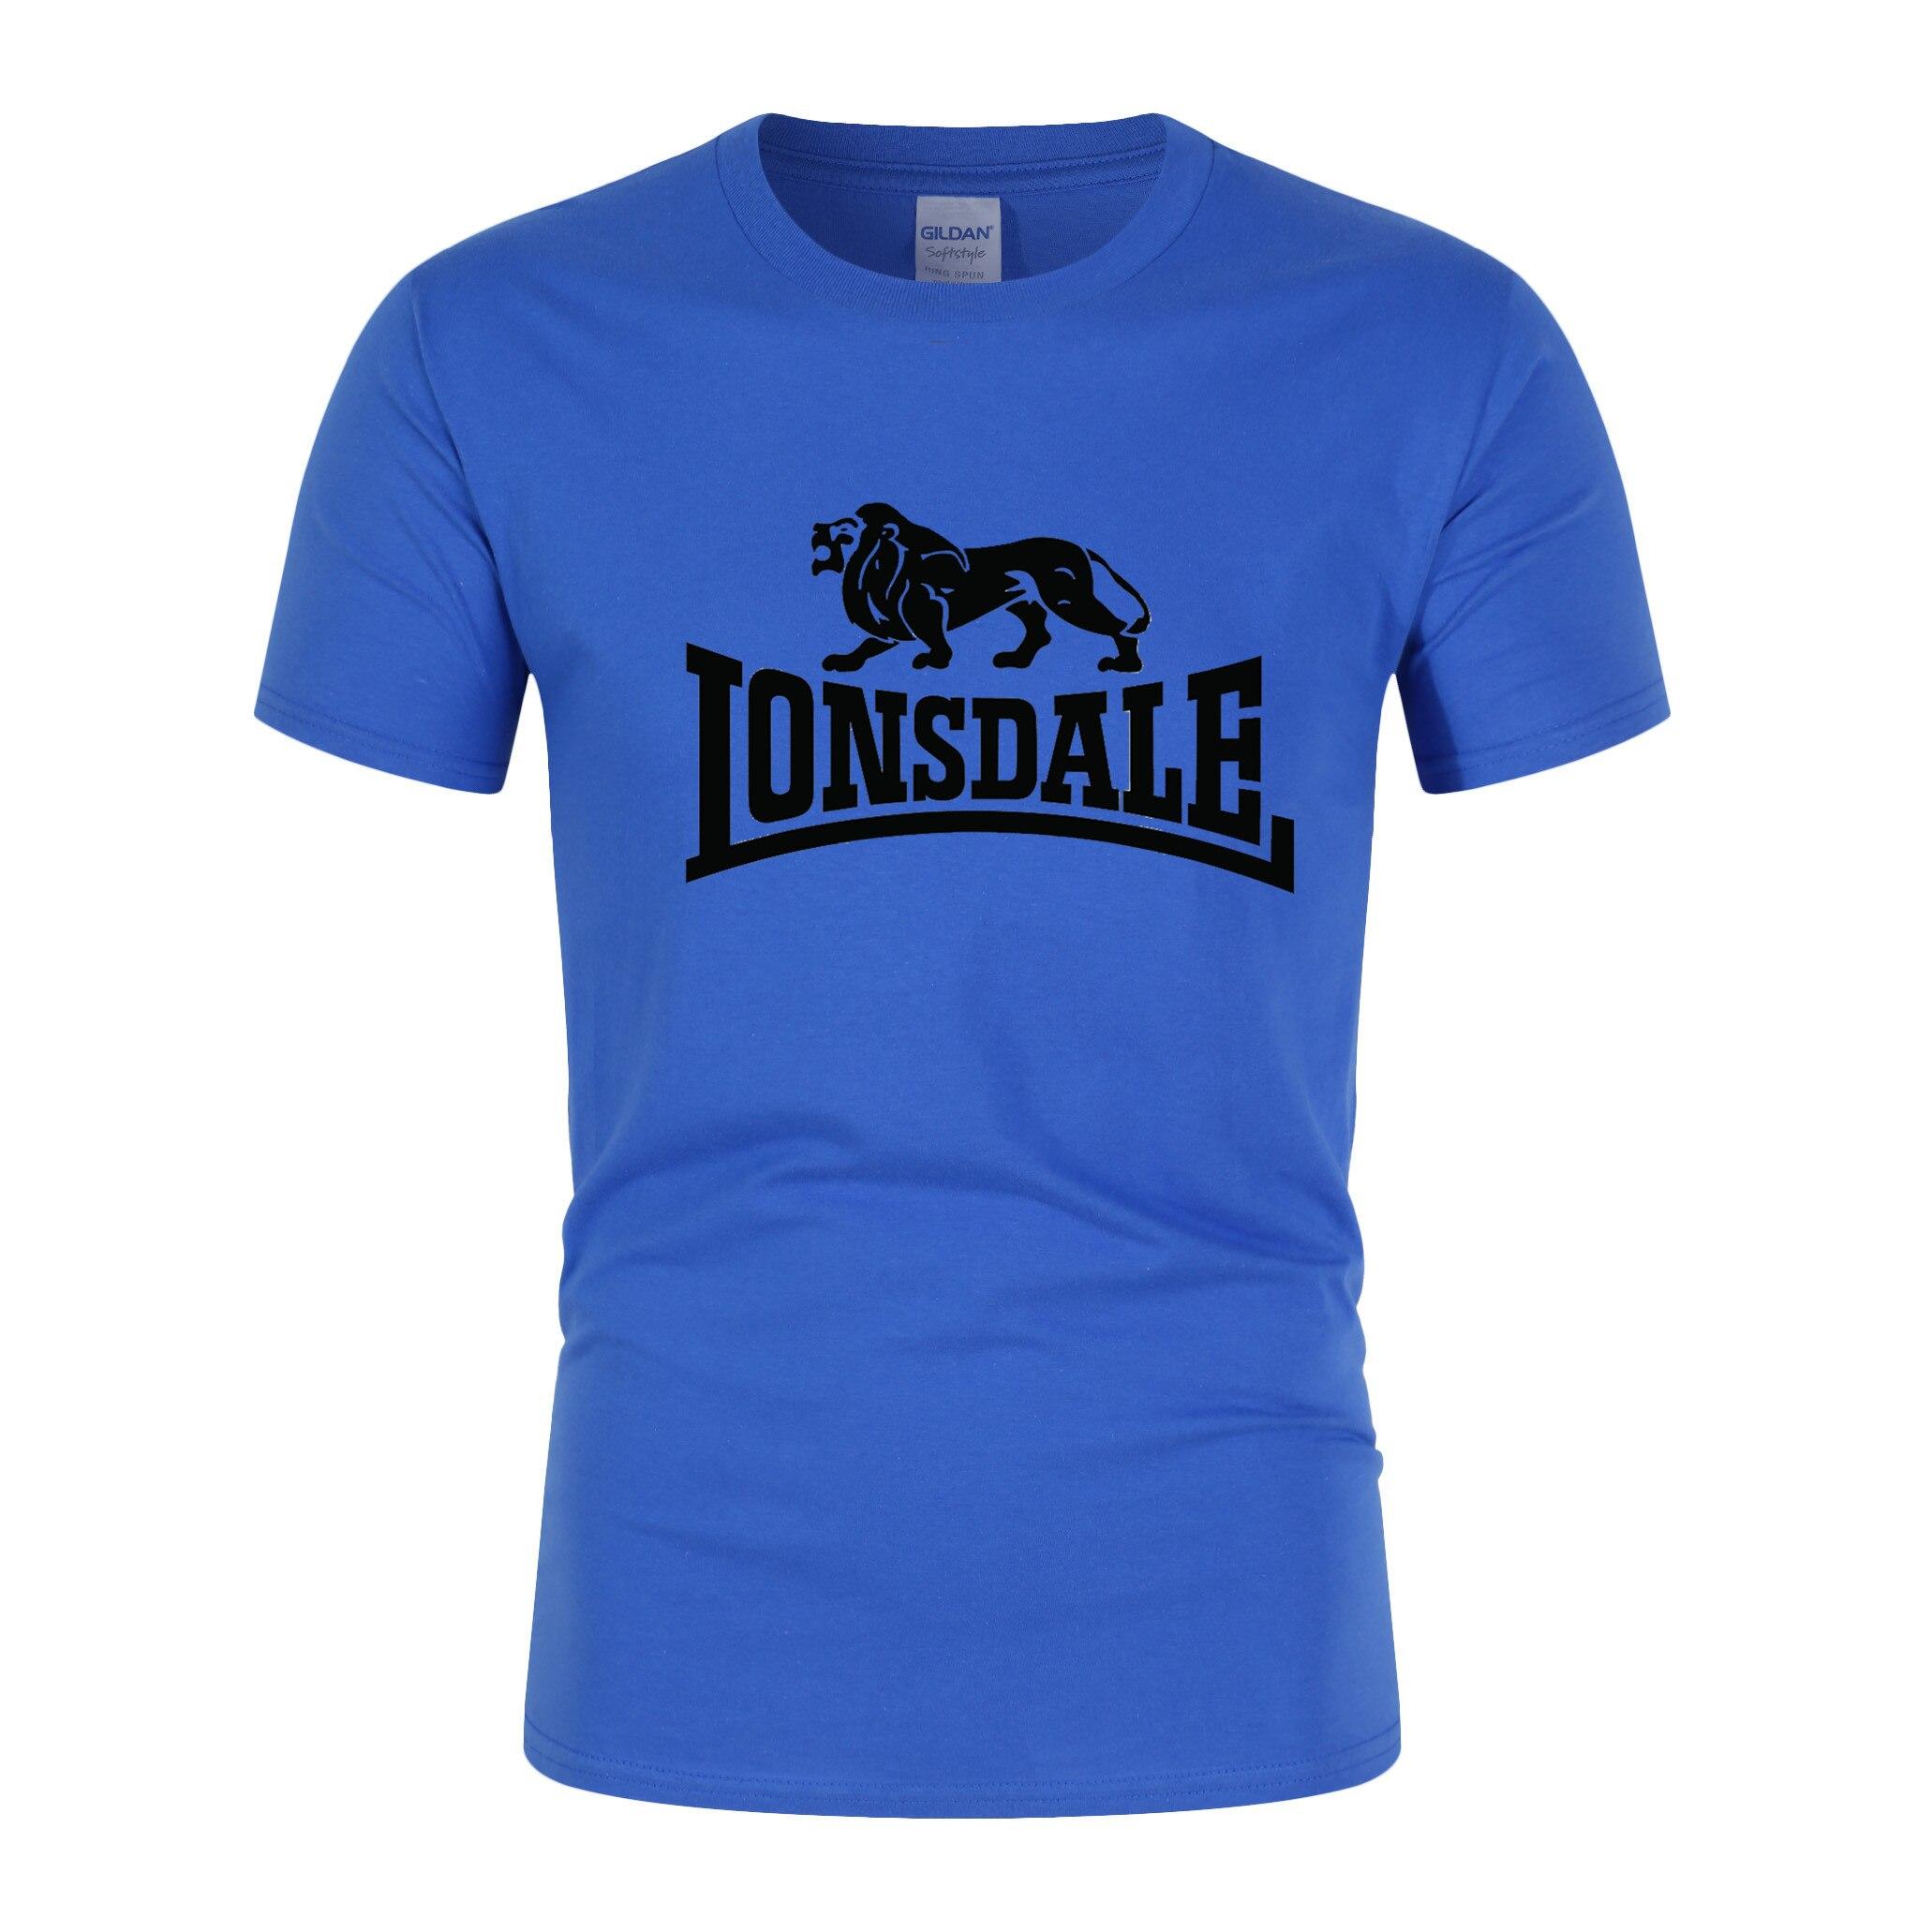 Summer Men's Brand Top T-Shirt Cotton Short Sleeve Casual T-Shirt Running Sports Breathable Fitness Wear